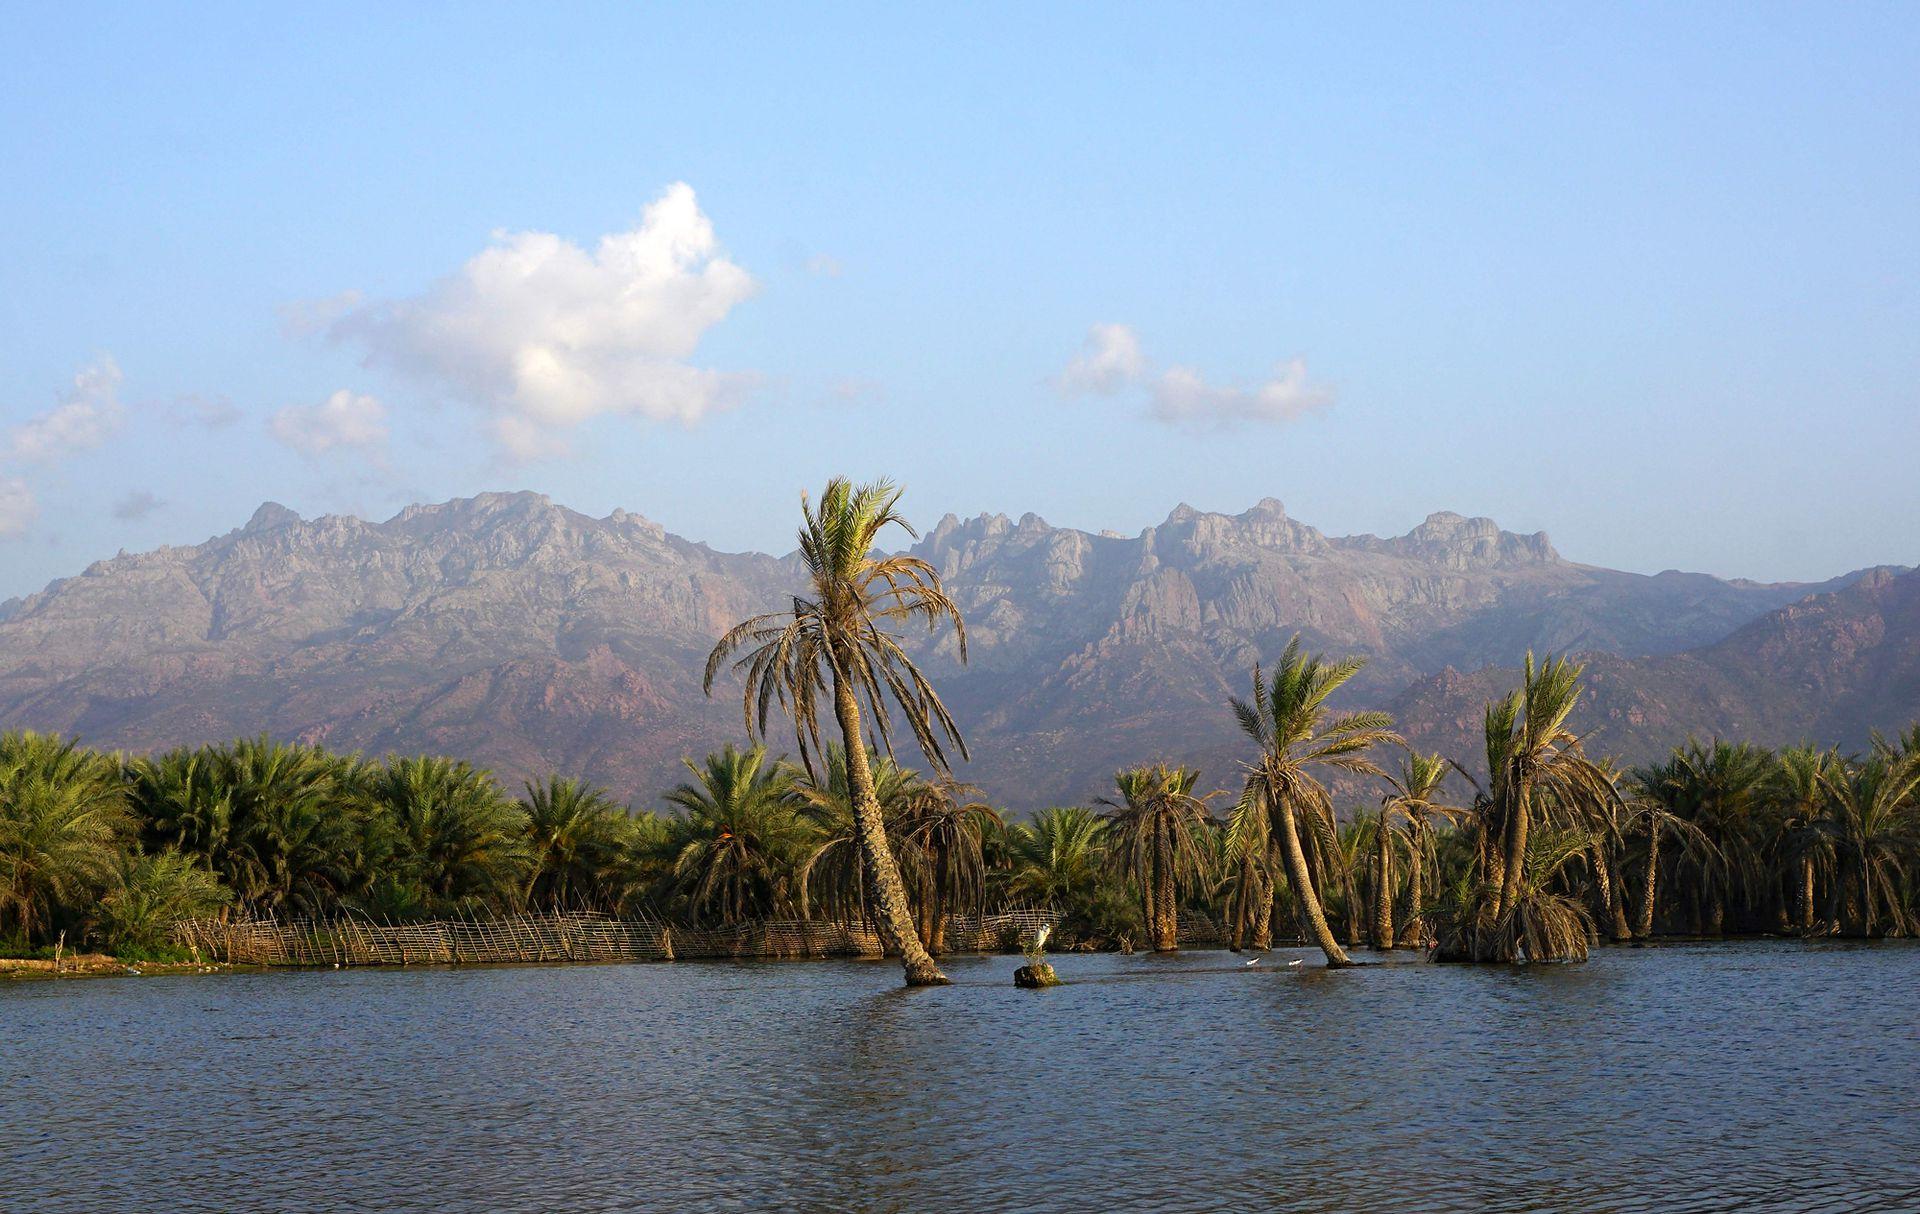 La isla yemení de Socotra mide 130 kilómetros